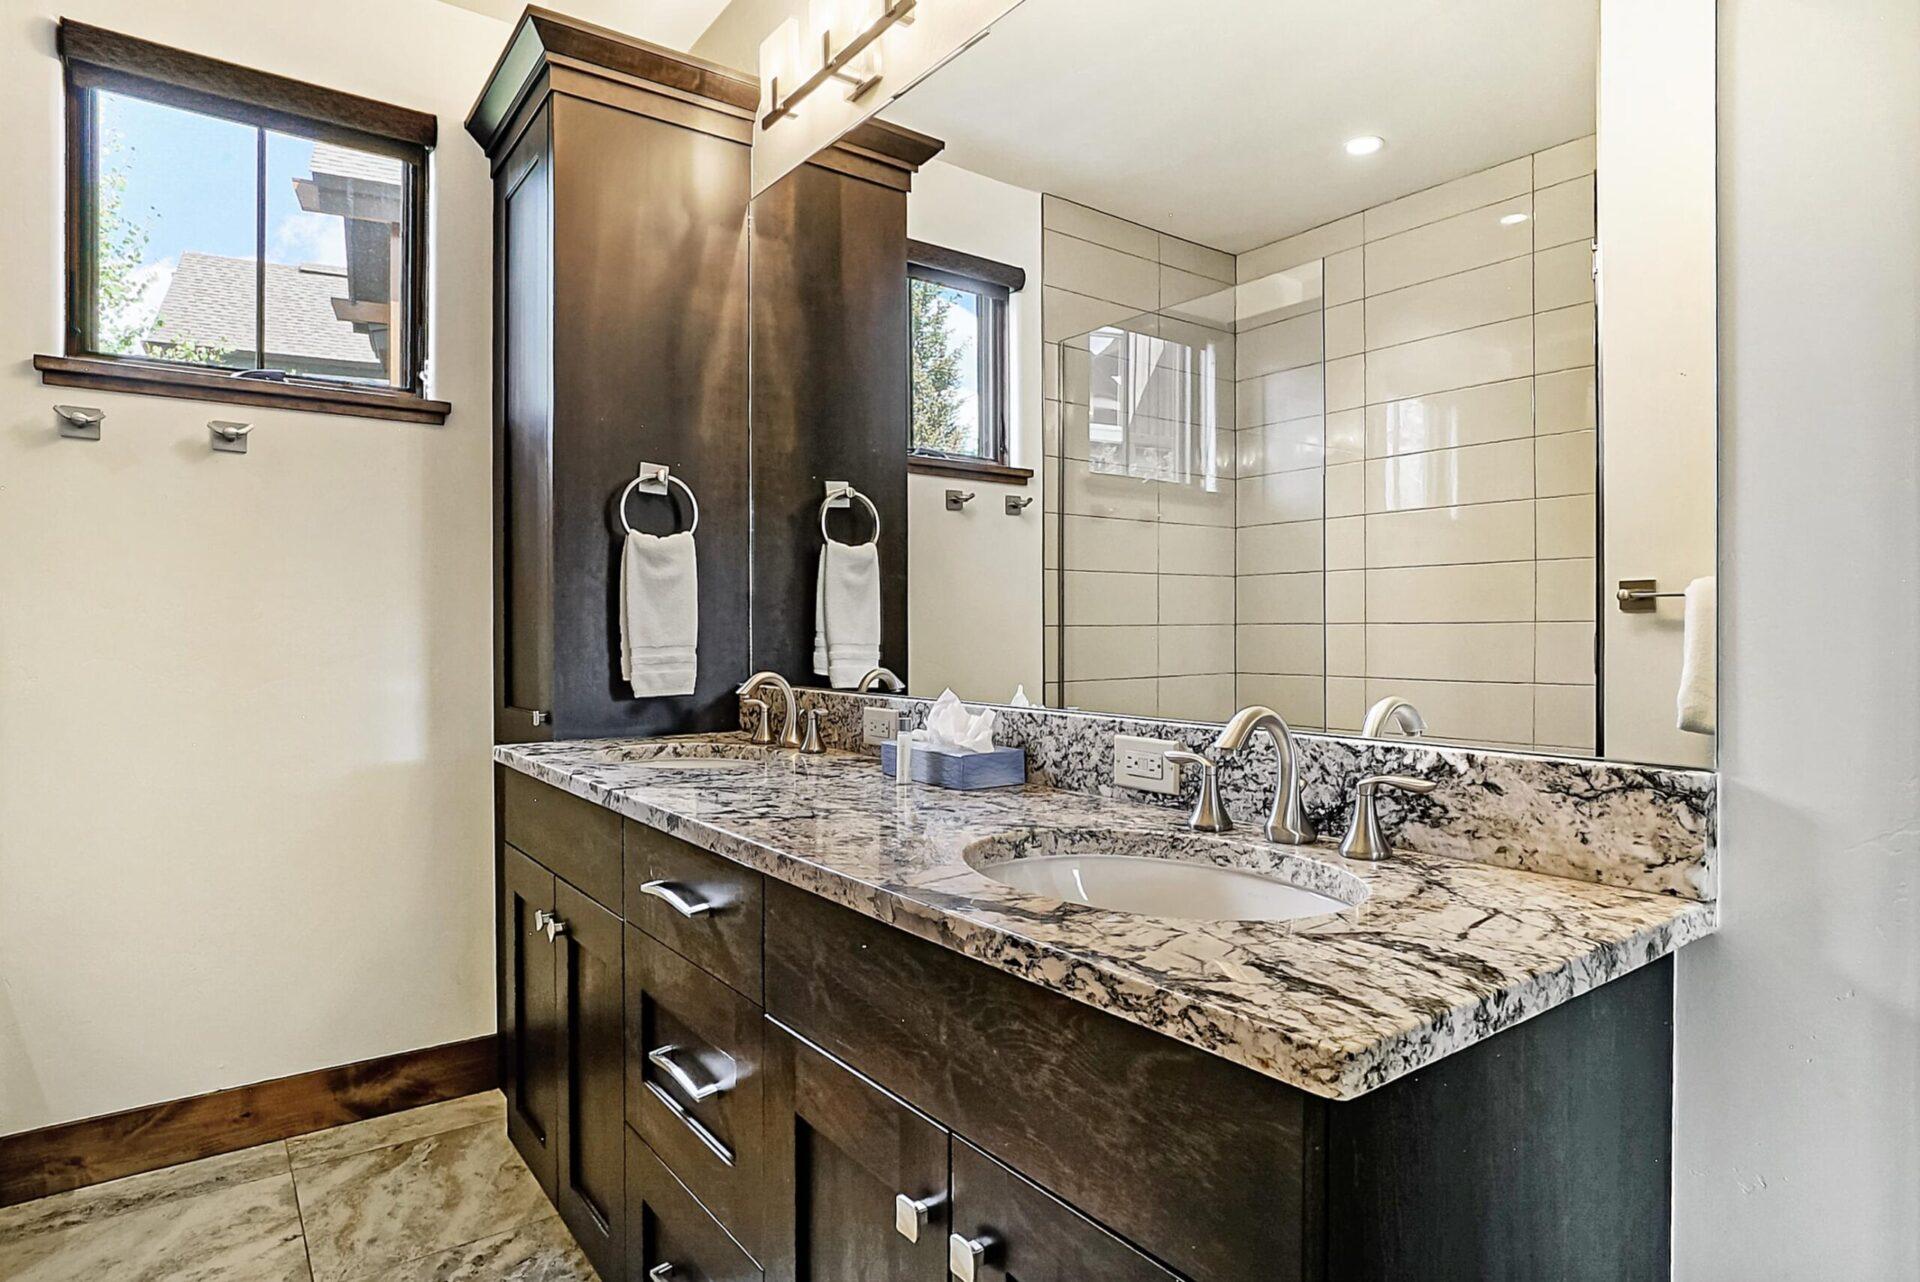 43.Downstairs_Bathroom_1_